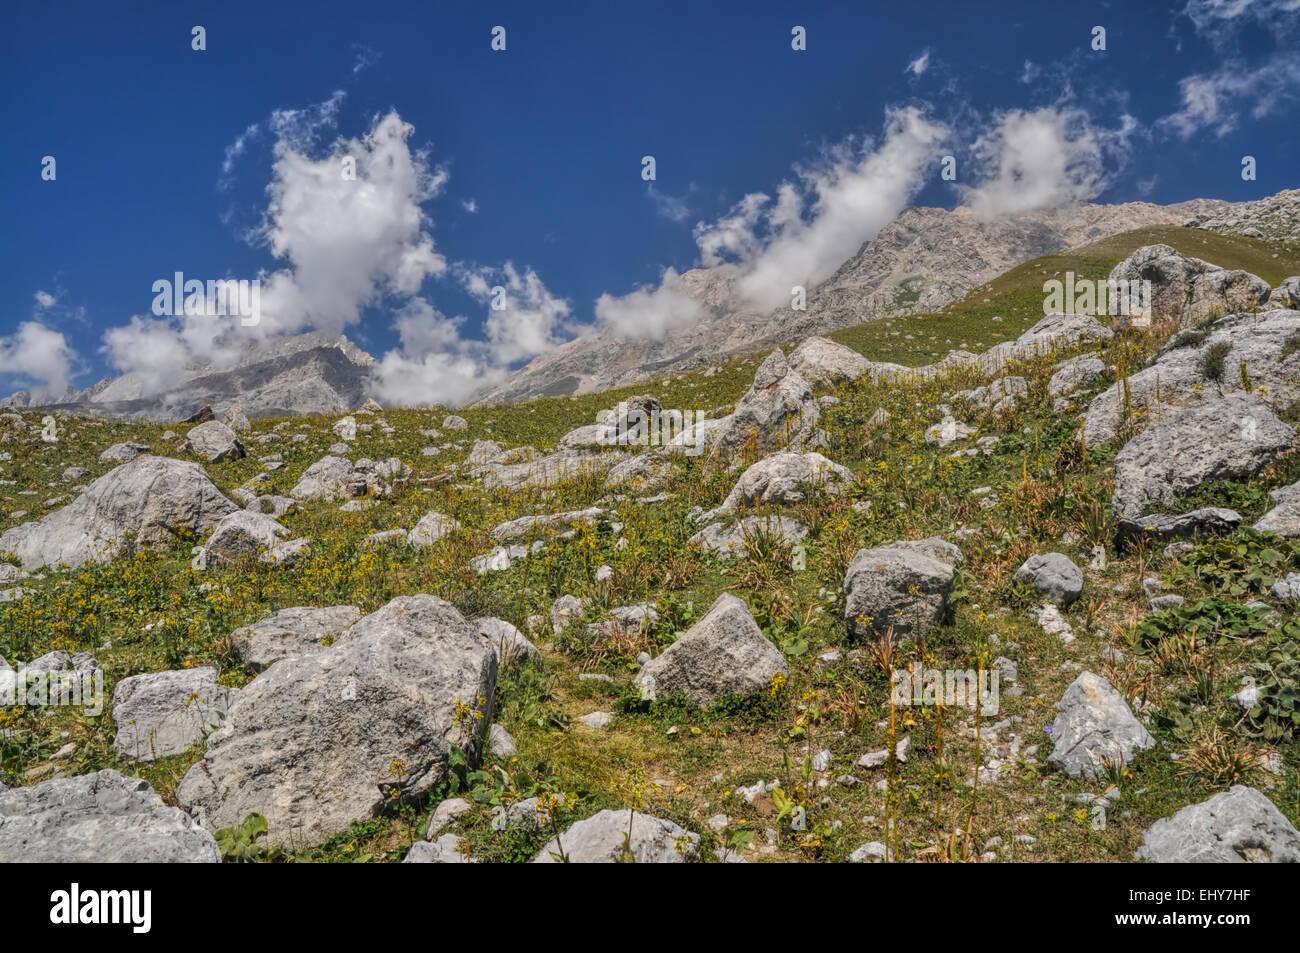 Scenic mountain range in Kyrgyzstan - Stock Image